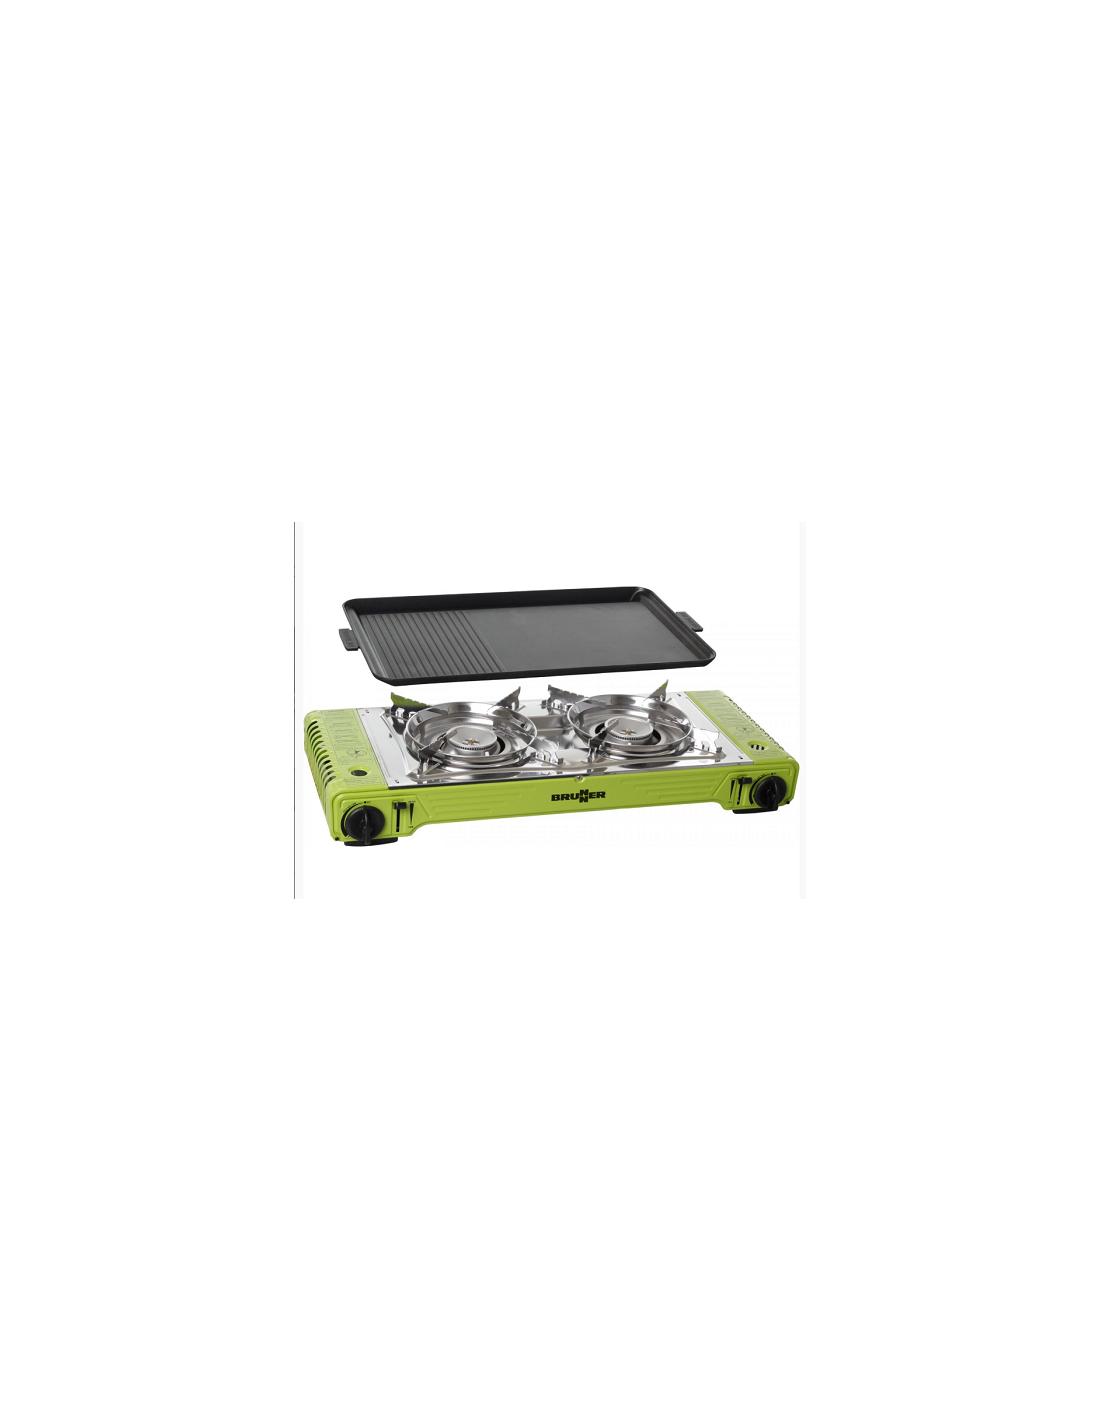 0708050N Cuisini/ère de Camping Magma Brunner 2 feux Gaz Compact Campeur Carvan Roulotte BRUNNER